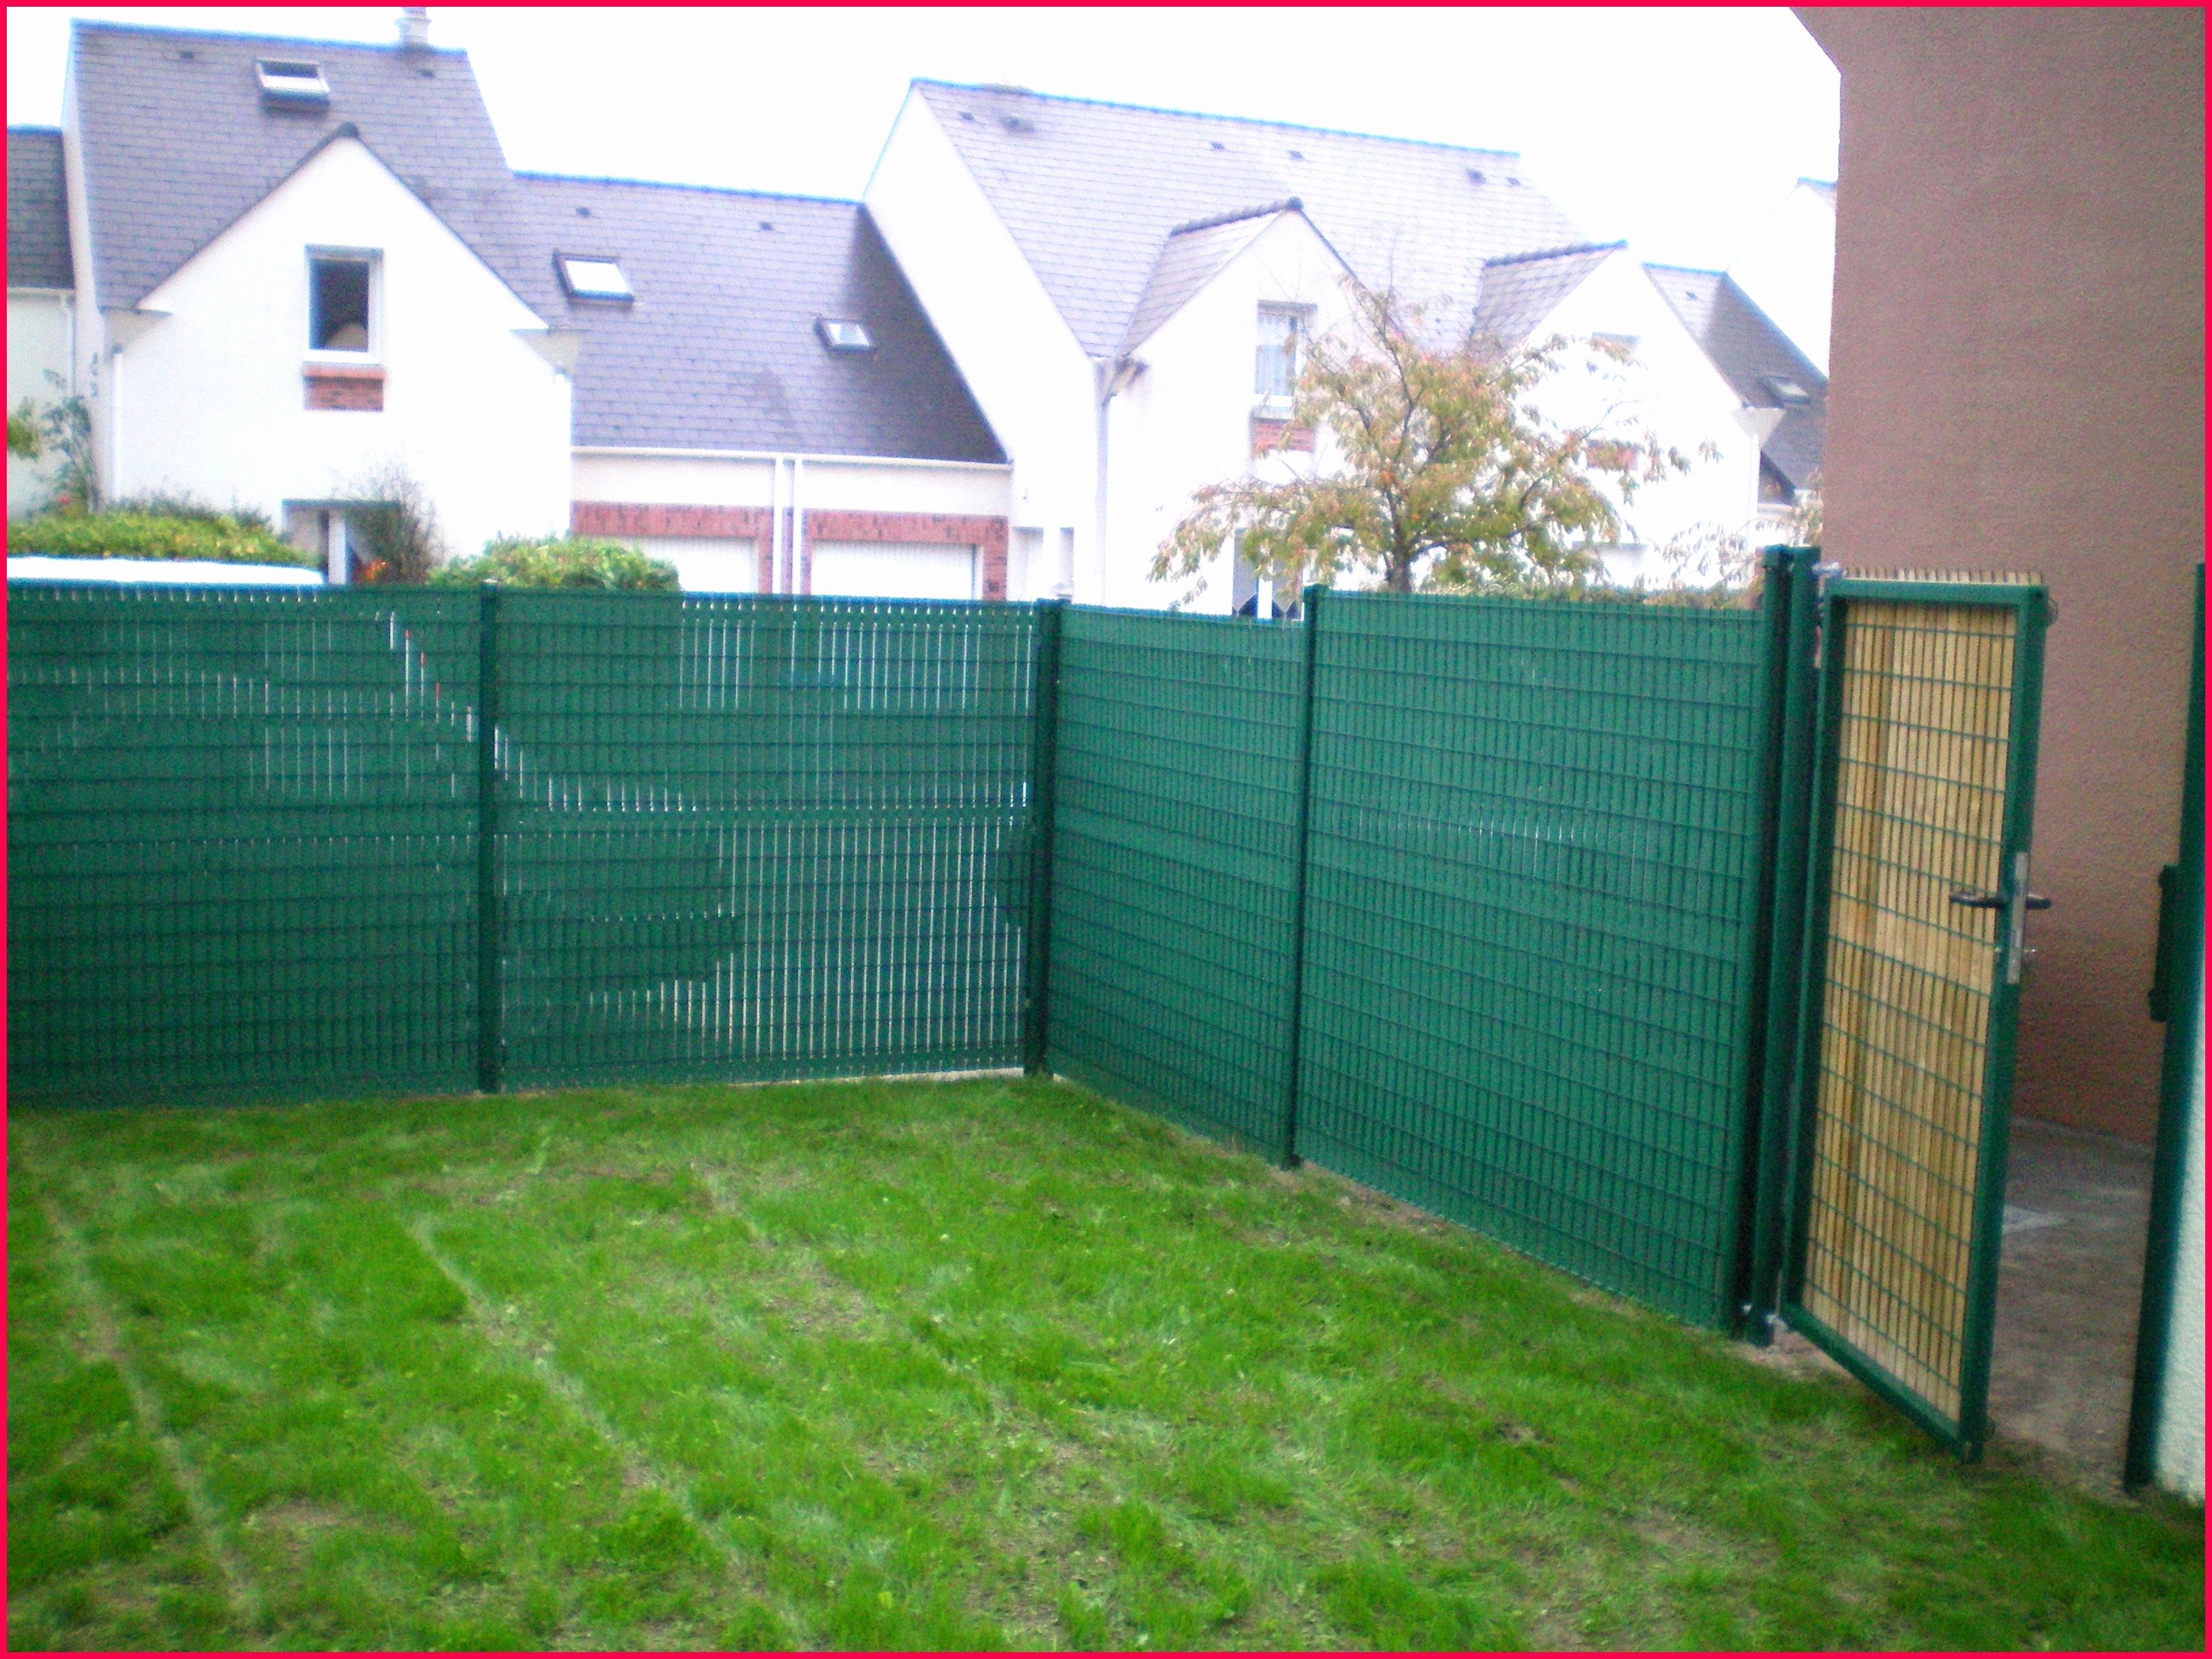 Beau Jardin Moderne Inspirant Collection Modele De Jardin Moderne Beau Cloture De Jardin Moderne Cloture